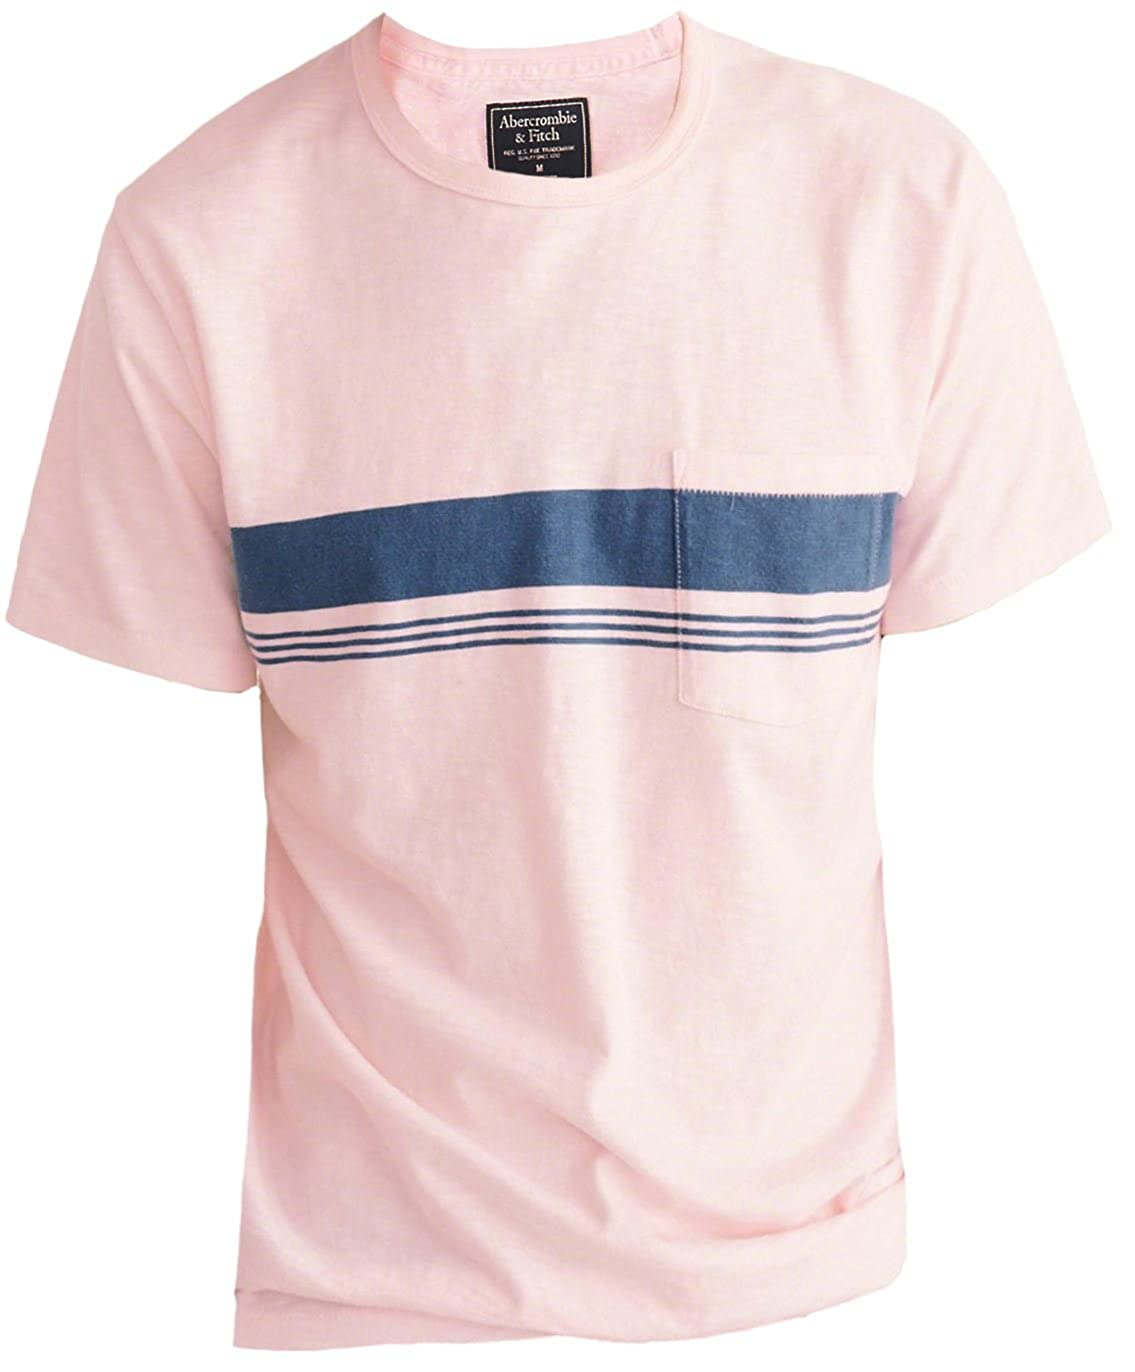 Abercrombie & Fitch - Camiseta - Camiseta - Rayas - Manga corta ...